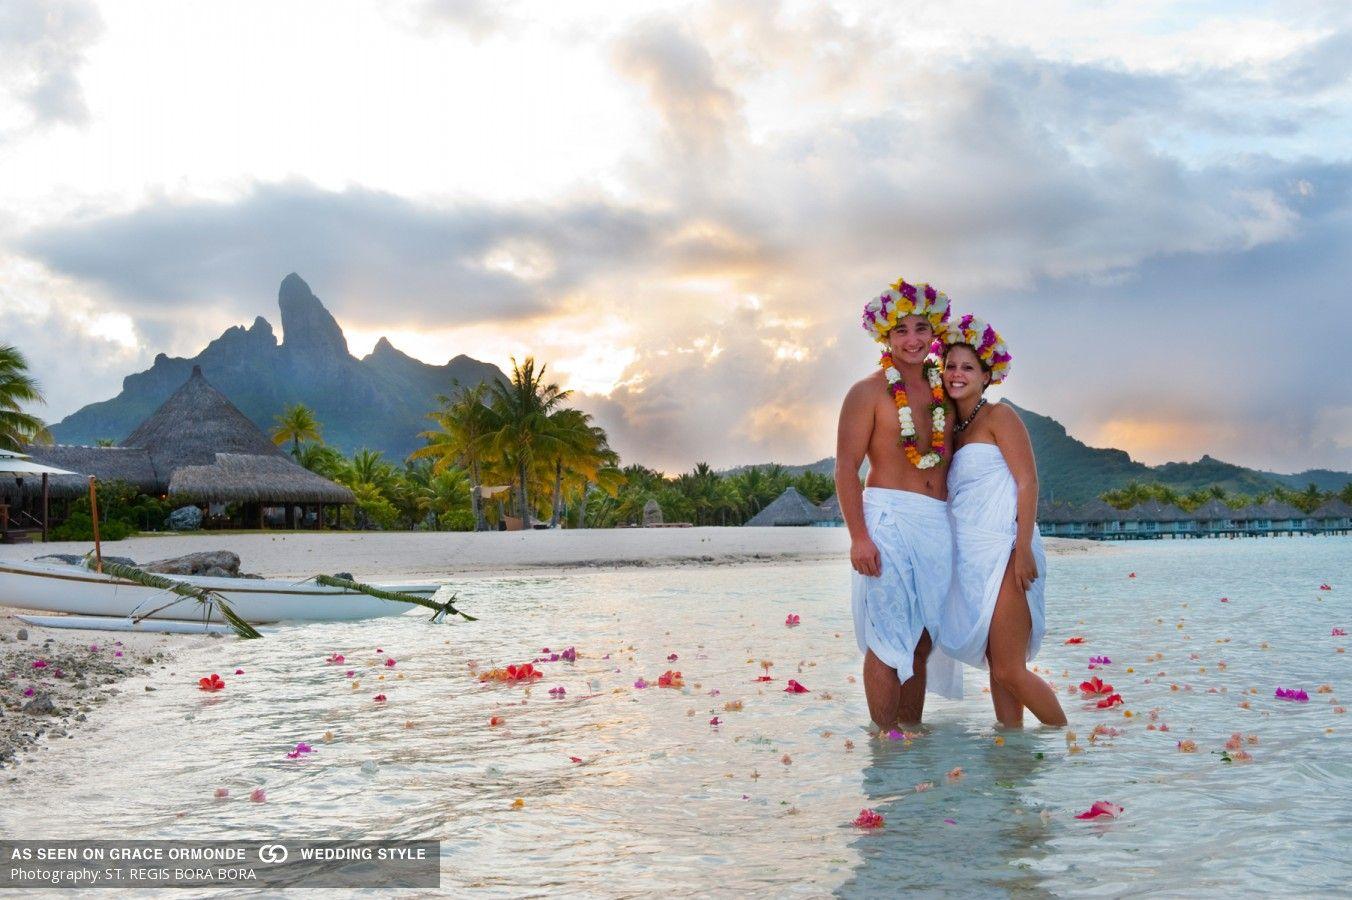 Wedding Ceremony On The Beach At St Regis Bora Resort